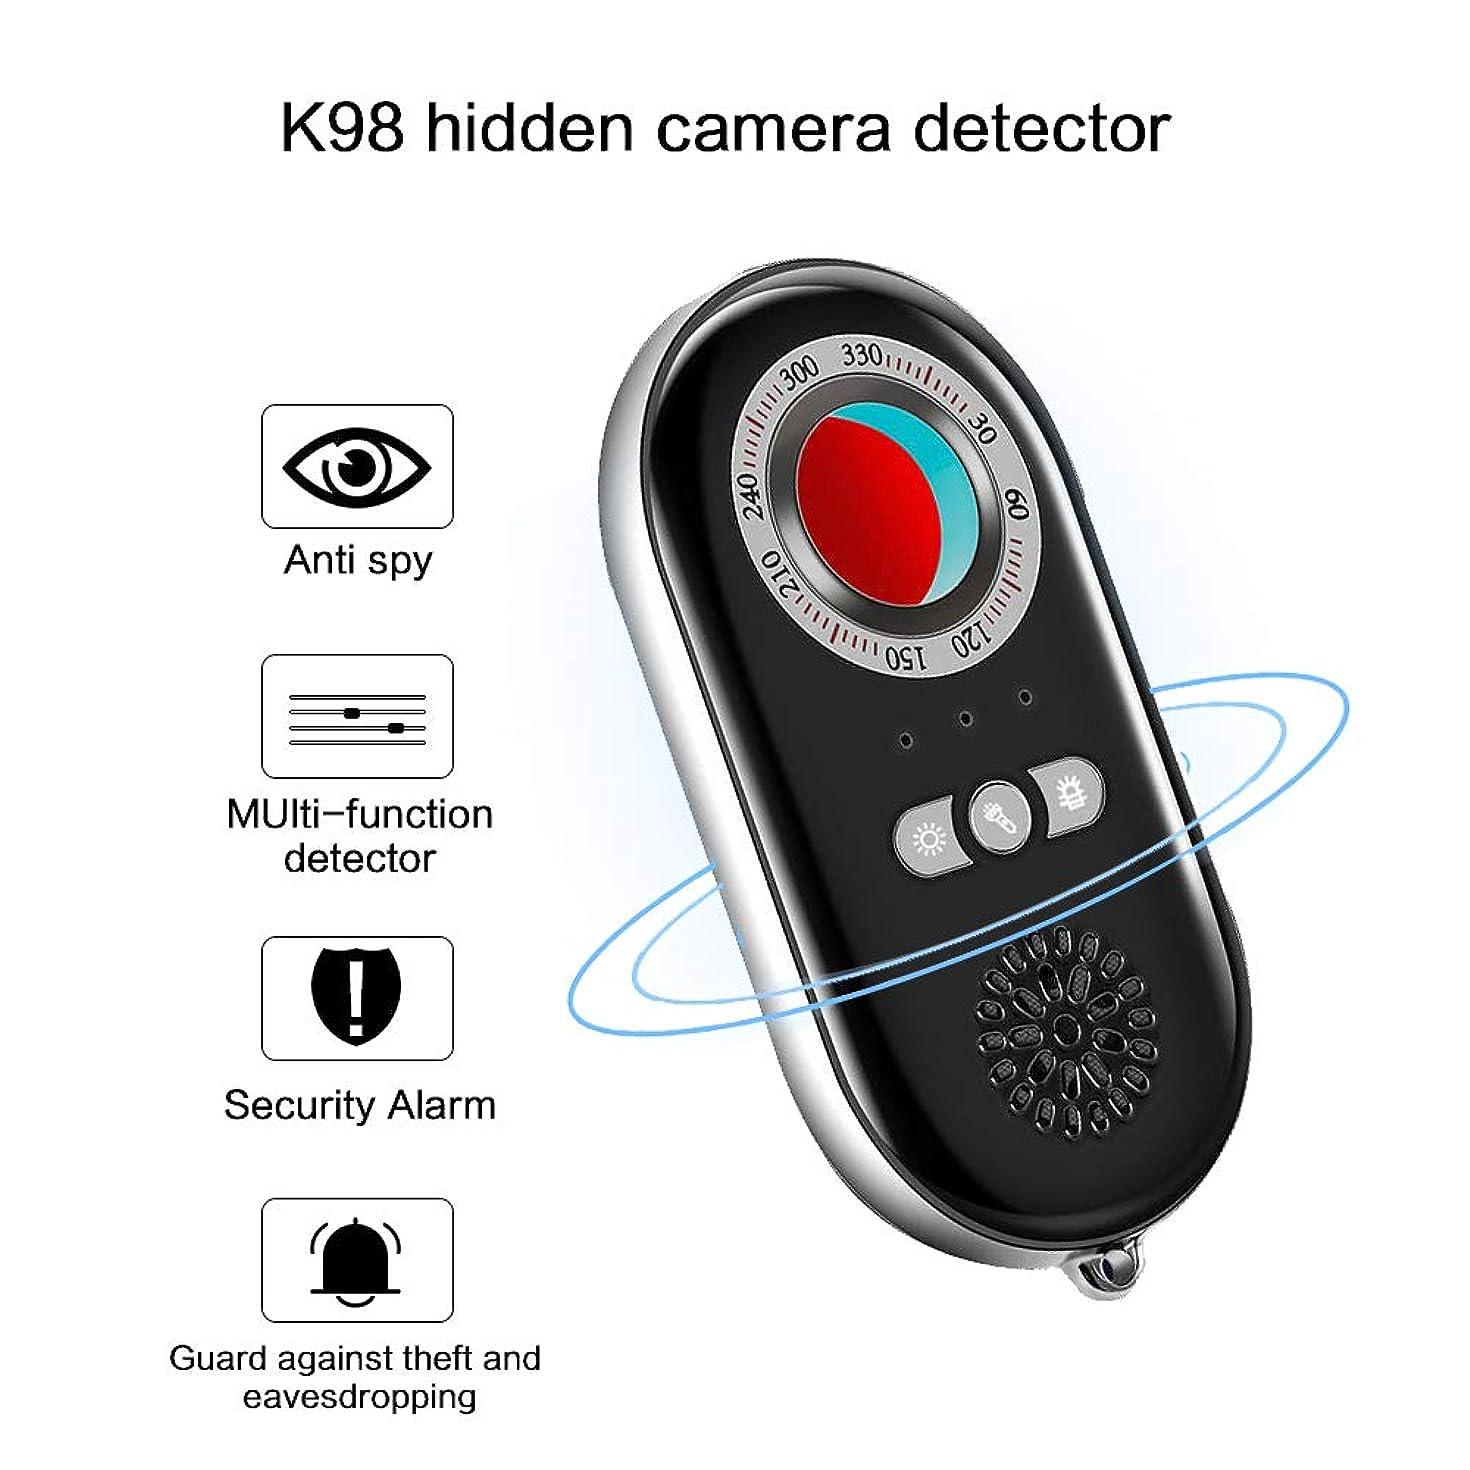 Amityke Anti Spy Hidden Camera Detector RF Bug Detector Wireless Signal Scanner, Personal Security Alarm Security Motion Vibration Sensorfor Travel Home Hotel